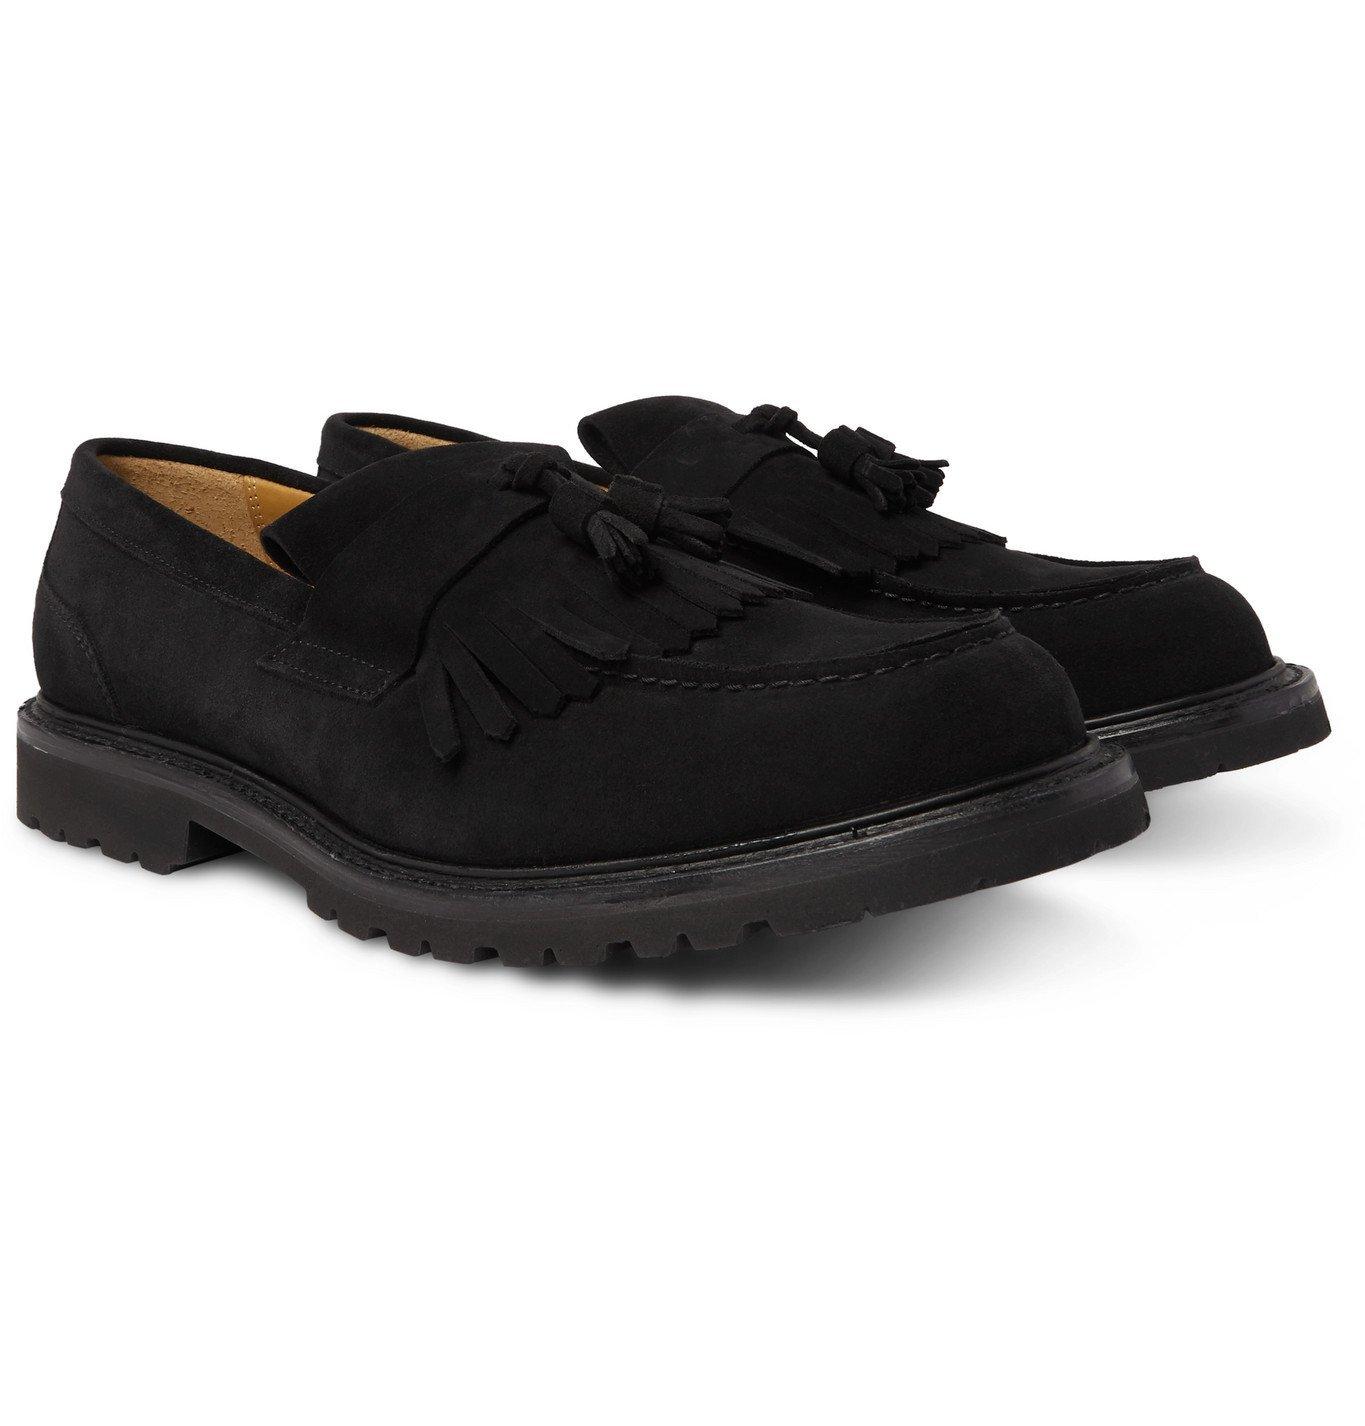 Photo: Mr P. - Heath Suede Tasselled Loafers - Black